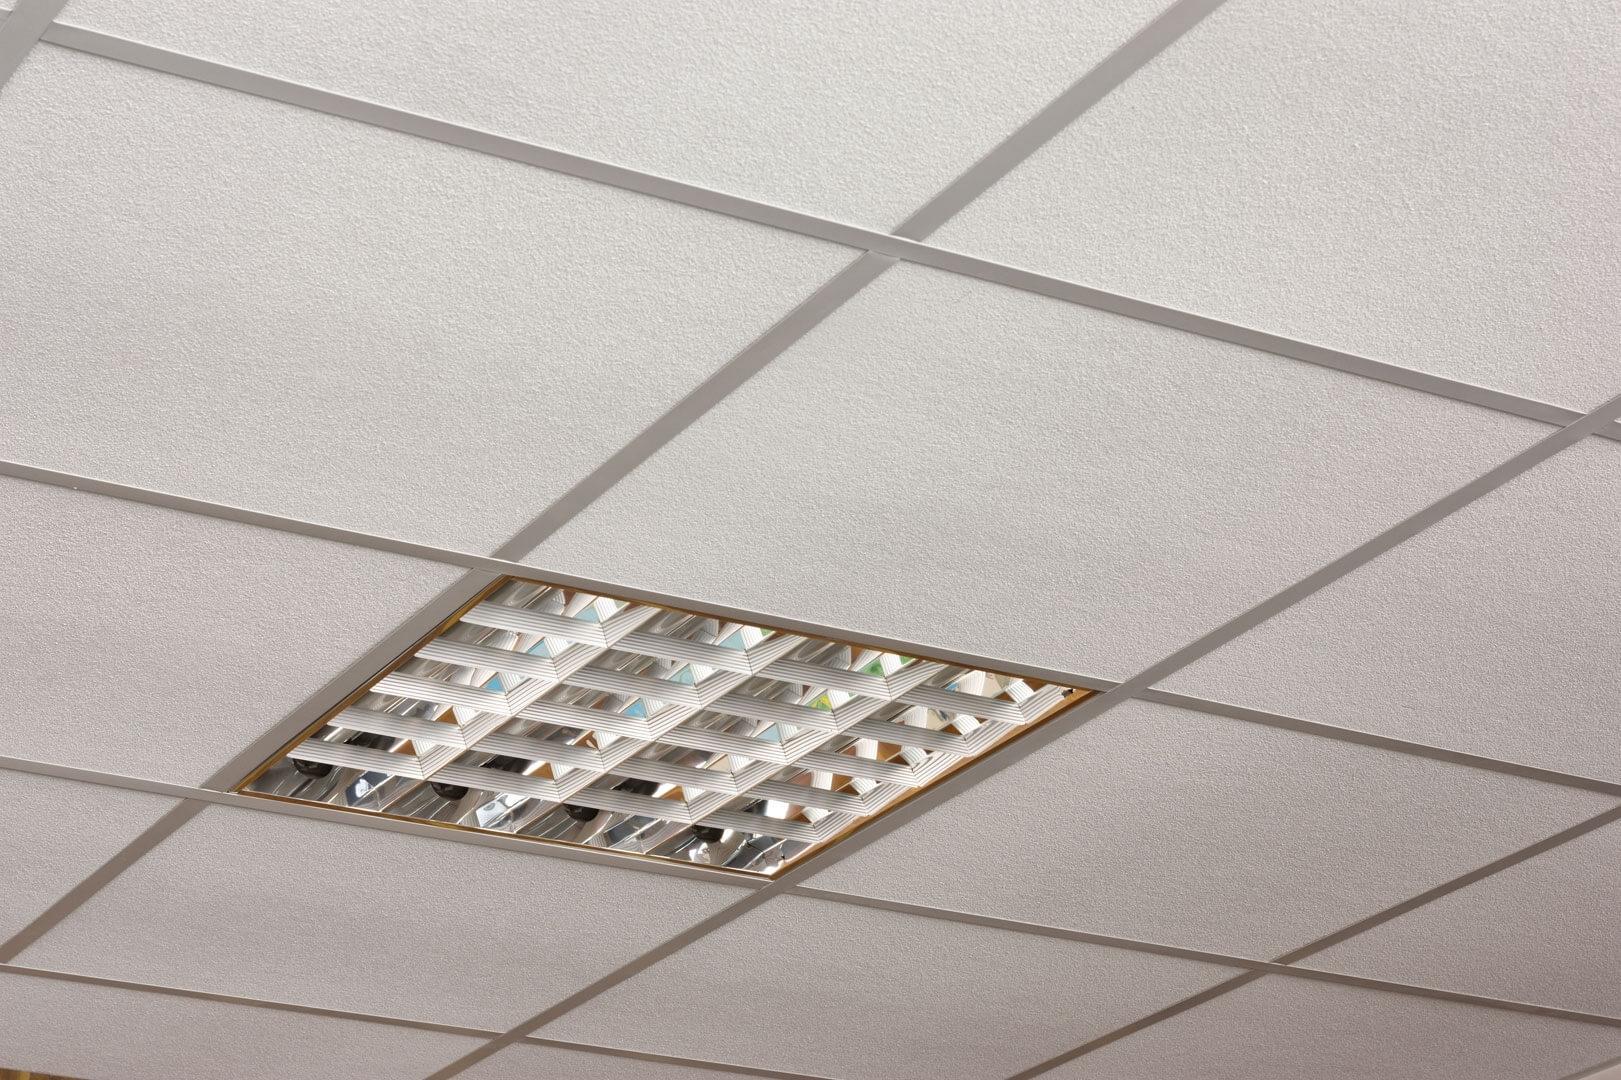 Armstrong Vinyl Faced Fiberglass Ceiling Tiles